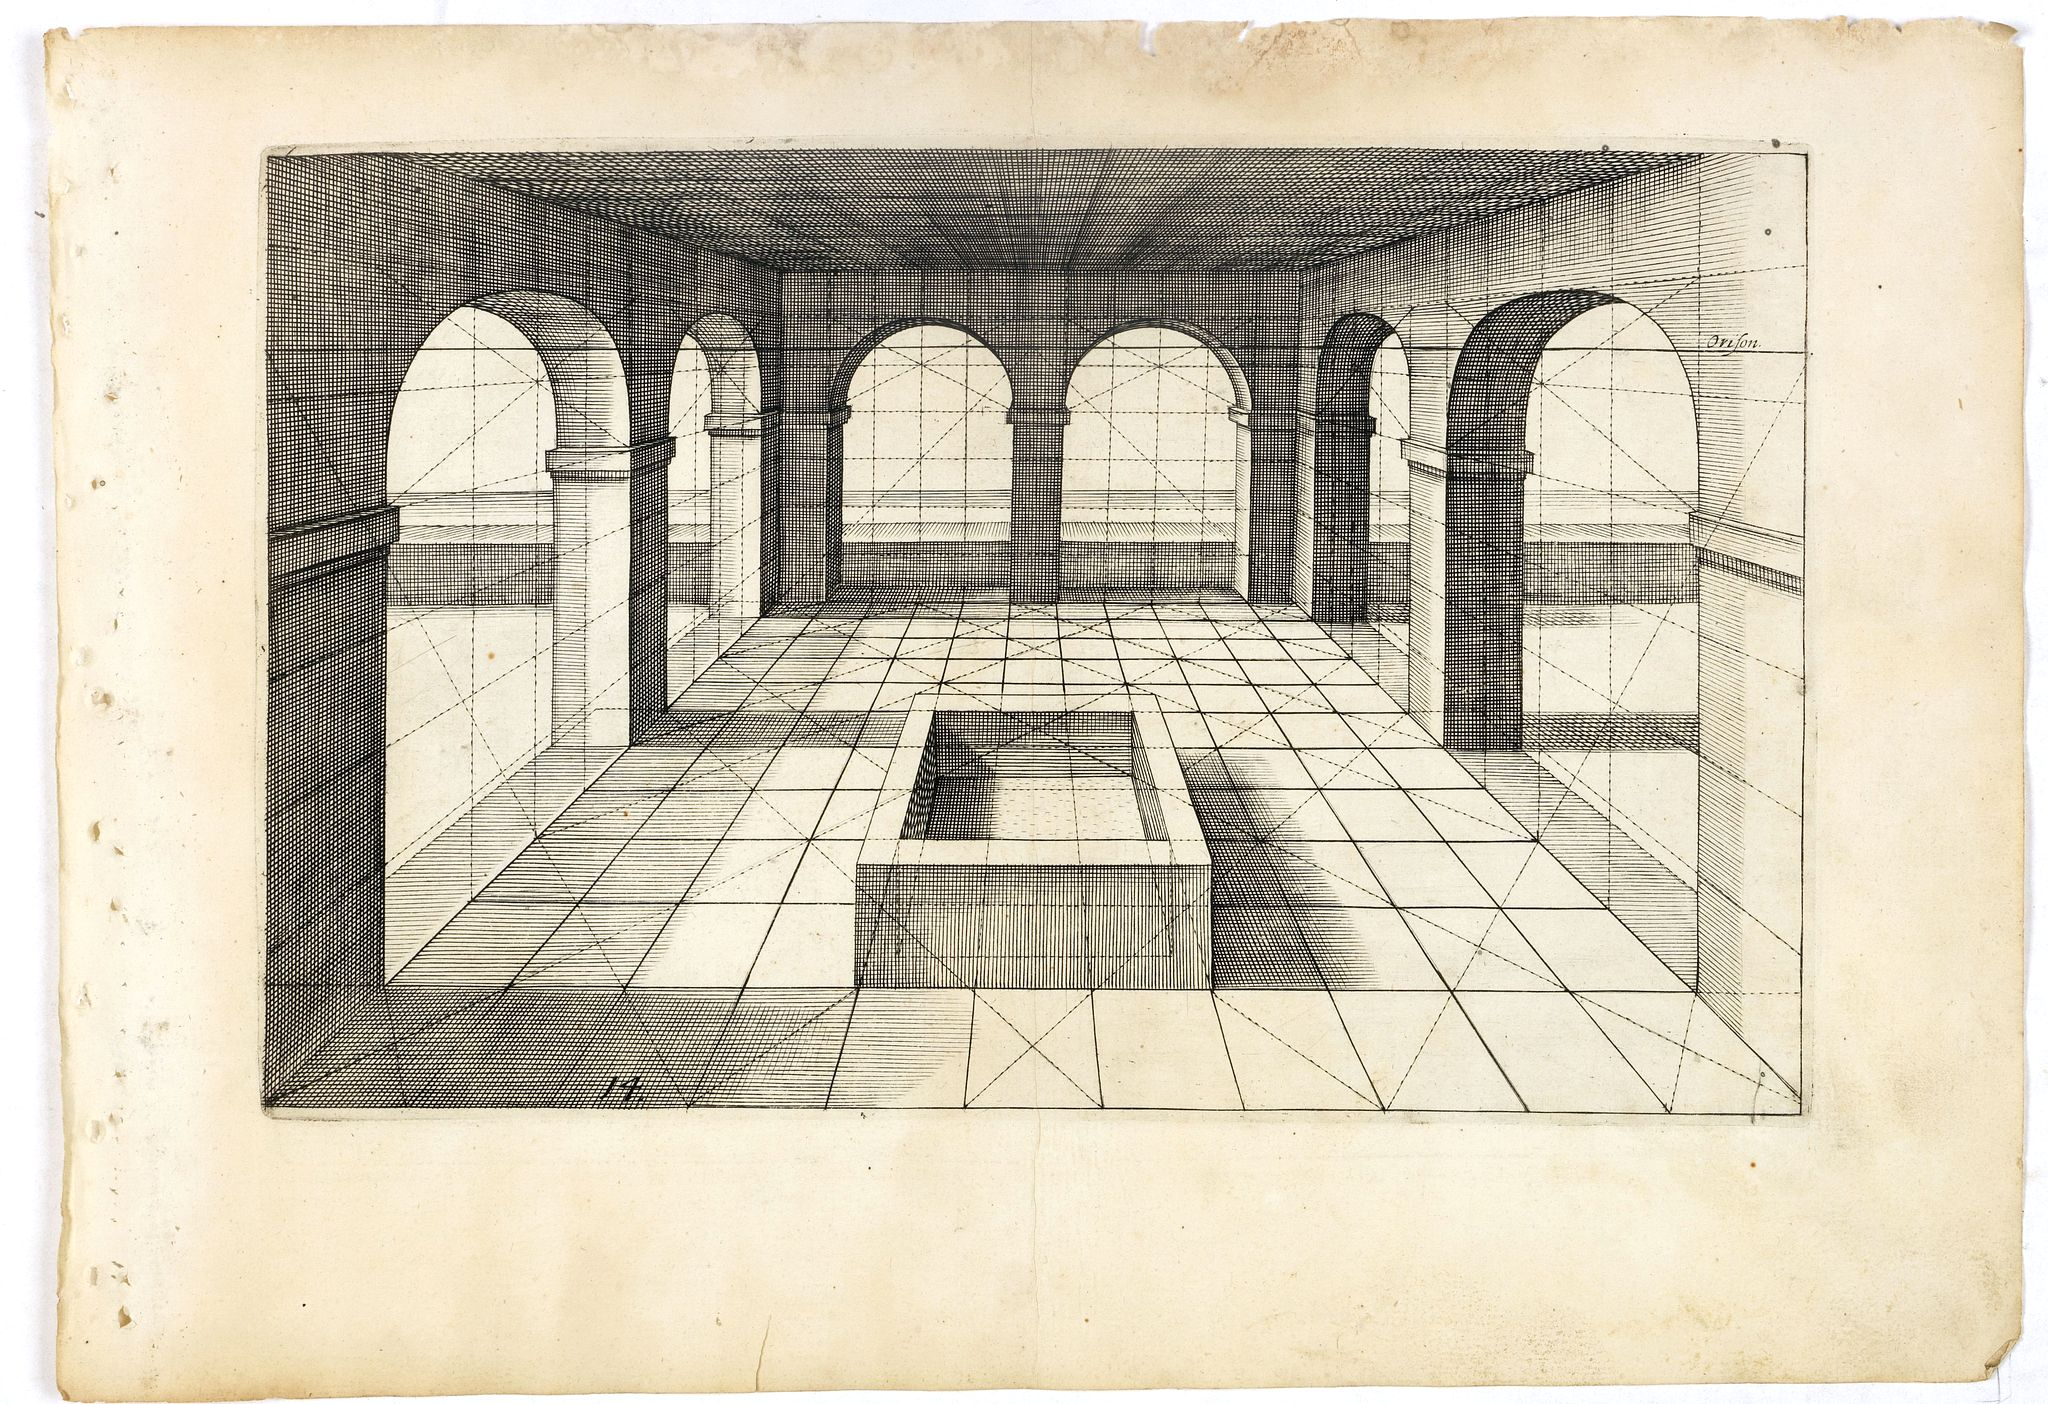 VREDEMAN DE VRIES, J. / HONDIUS, H. -  Perspective print by Vredeman de Vries. 14.